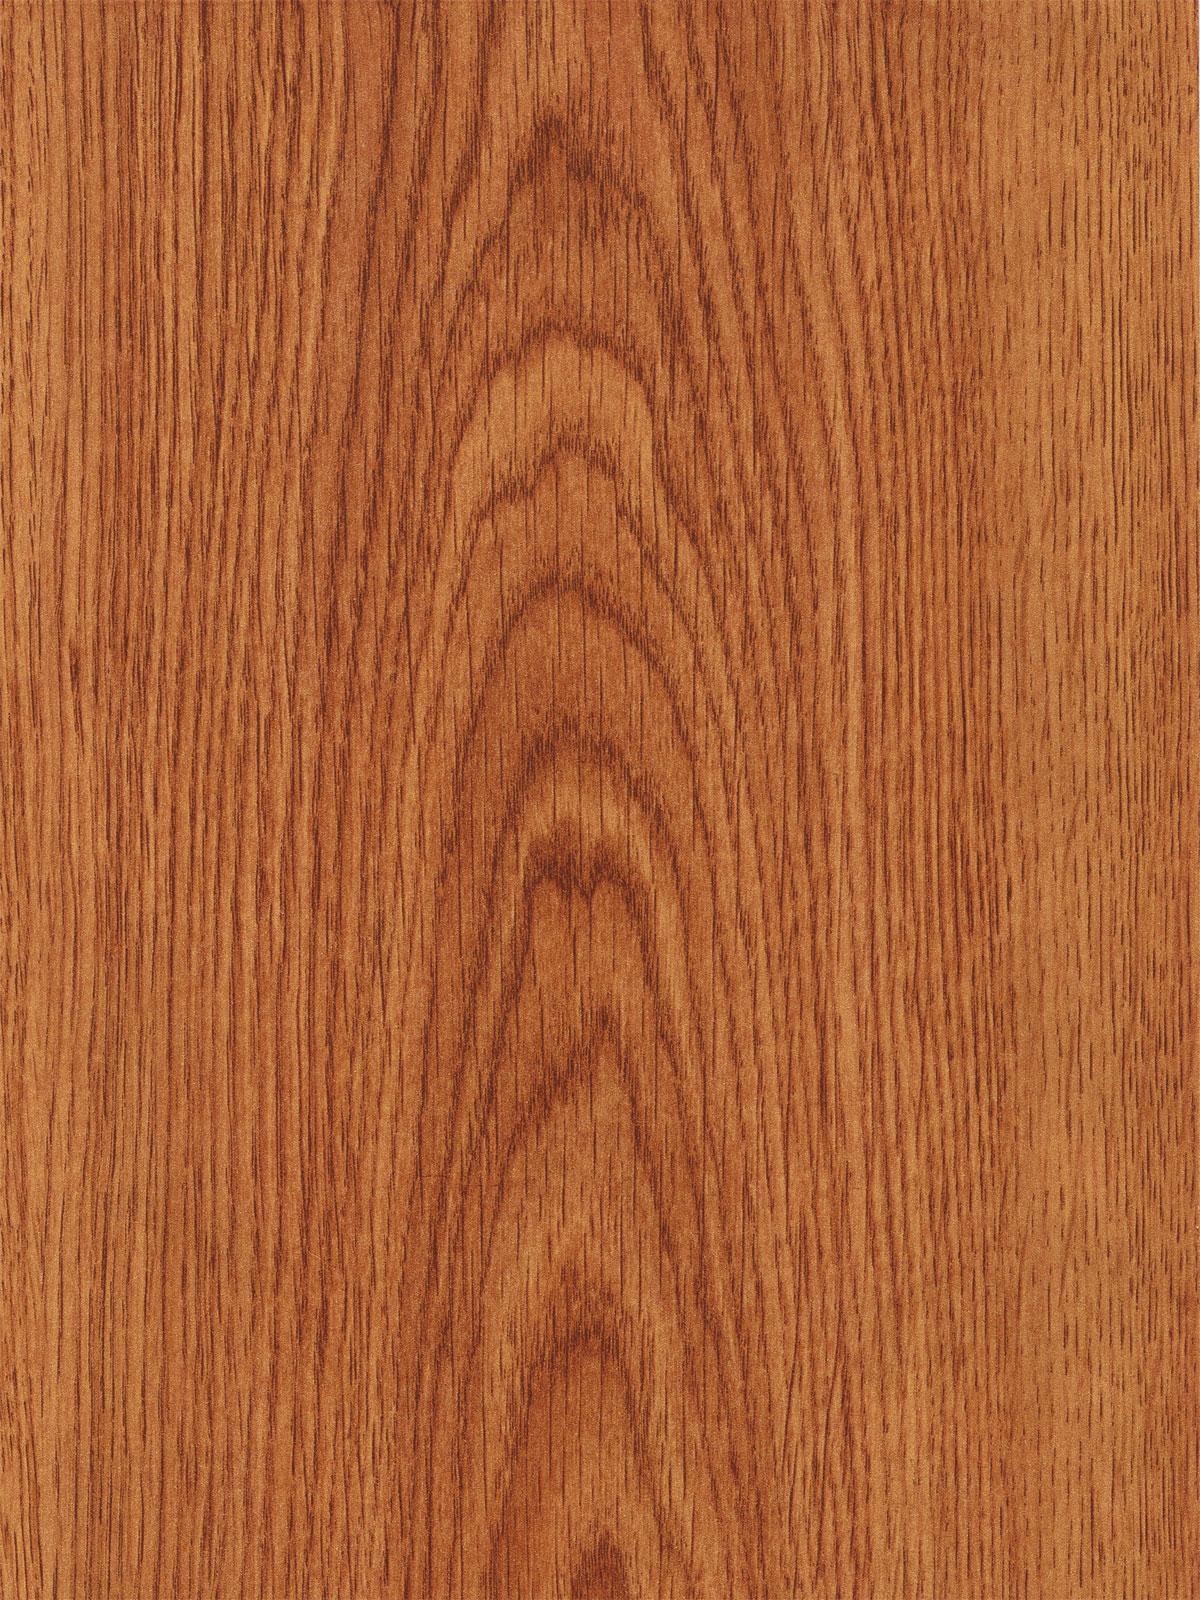 Laminate flooring colors wood floors